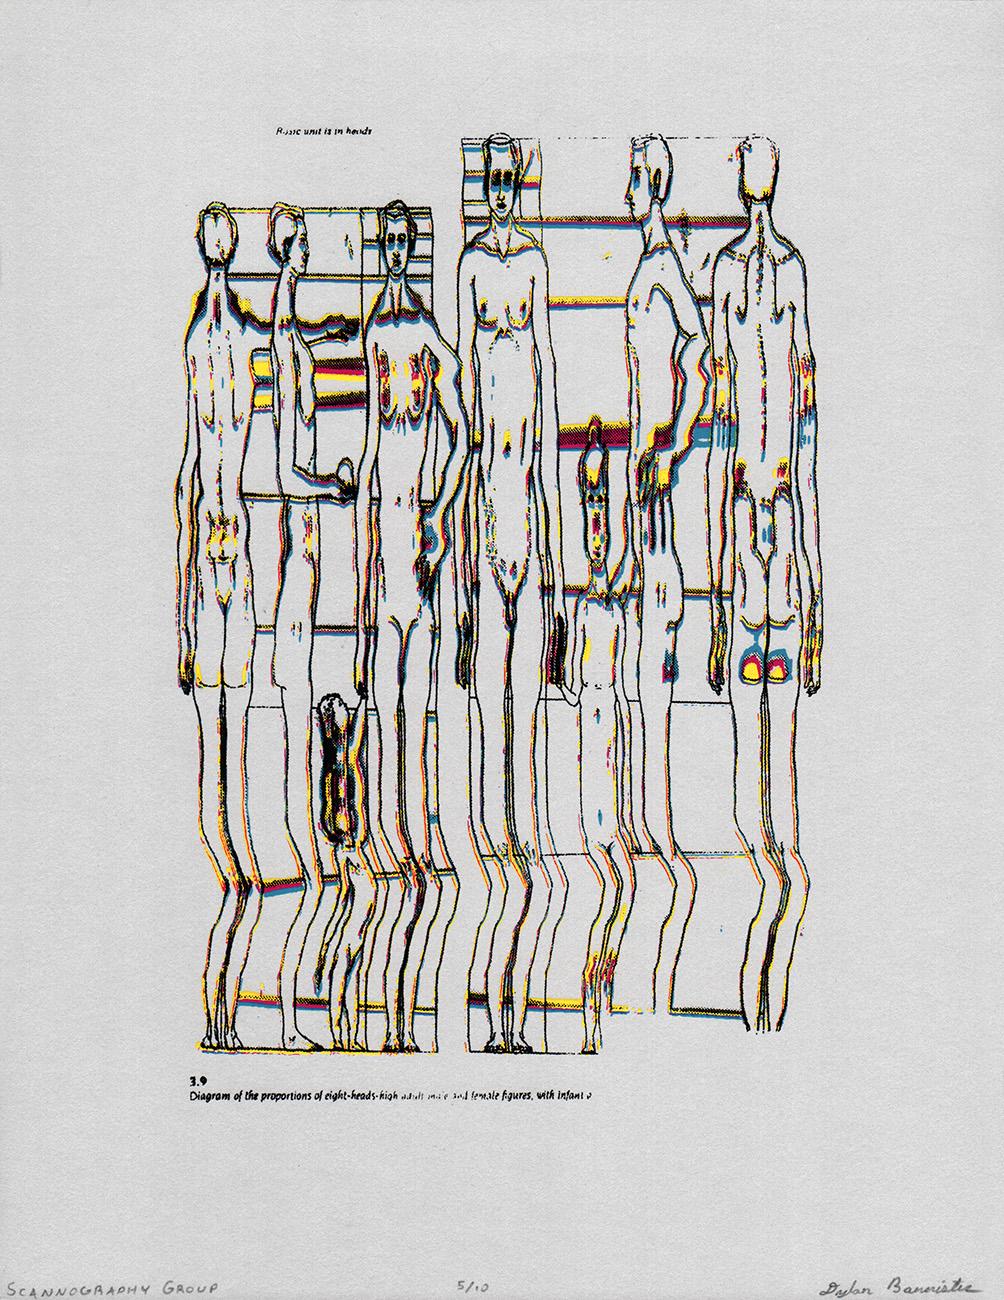 "<i>Scannography Bones</i><br>Silkscreen Print<br>10"" x 13""<br>2015"